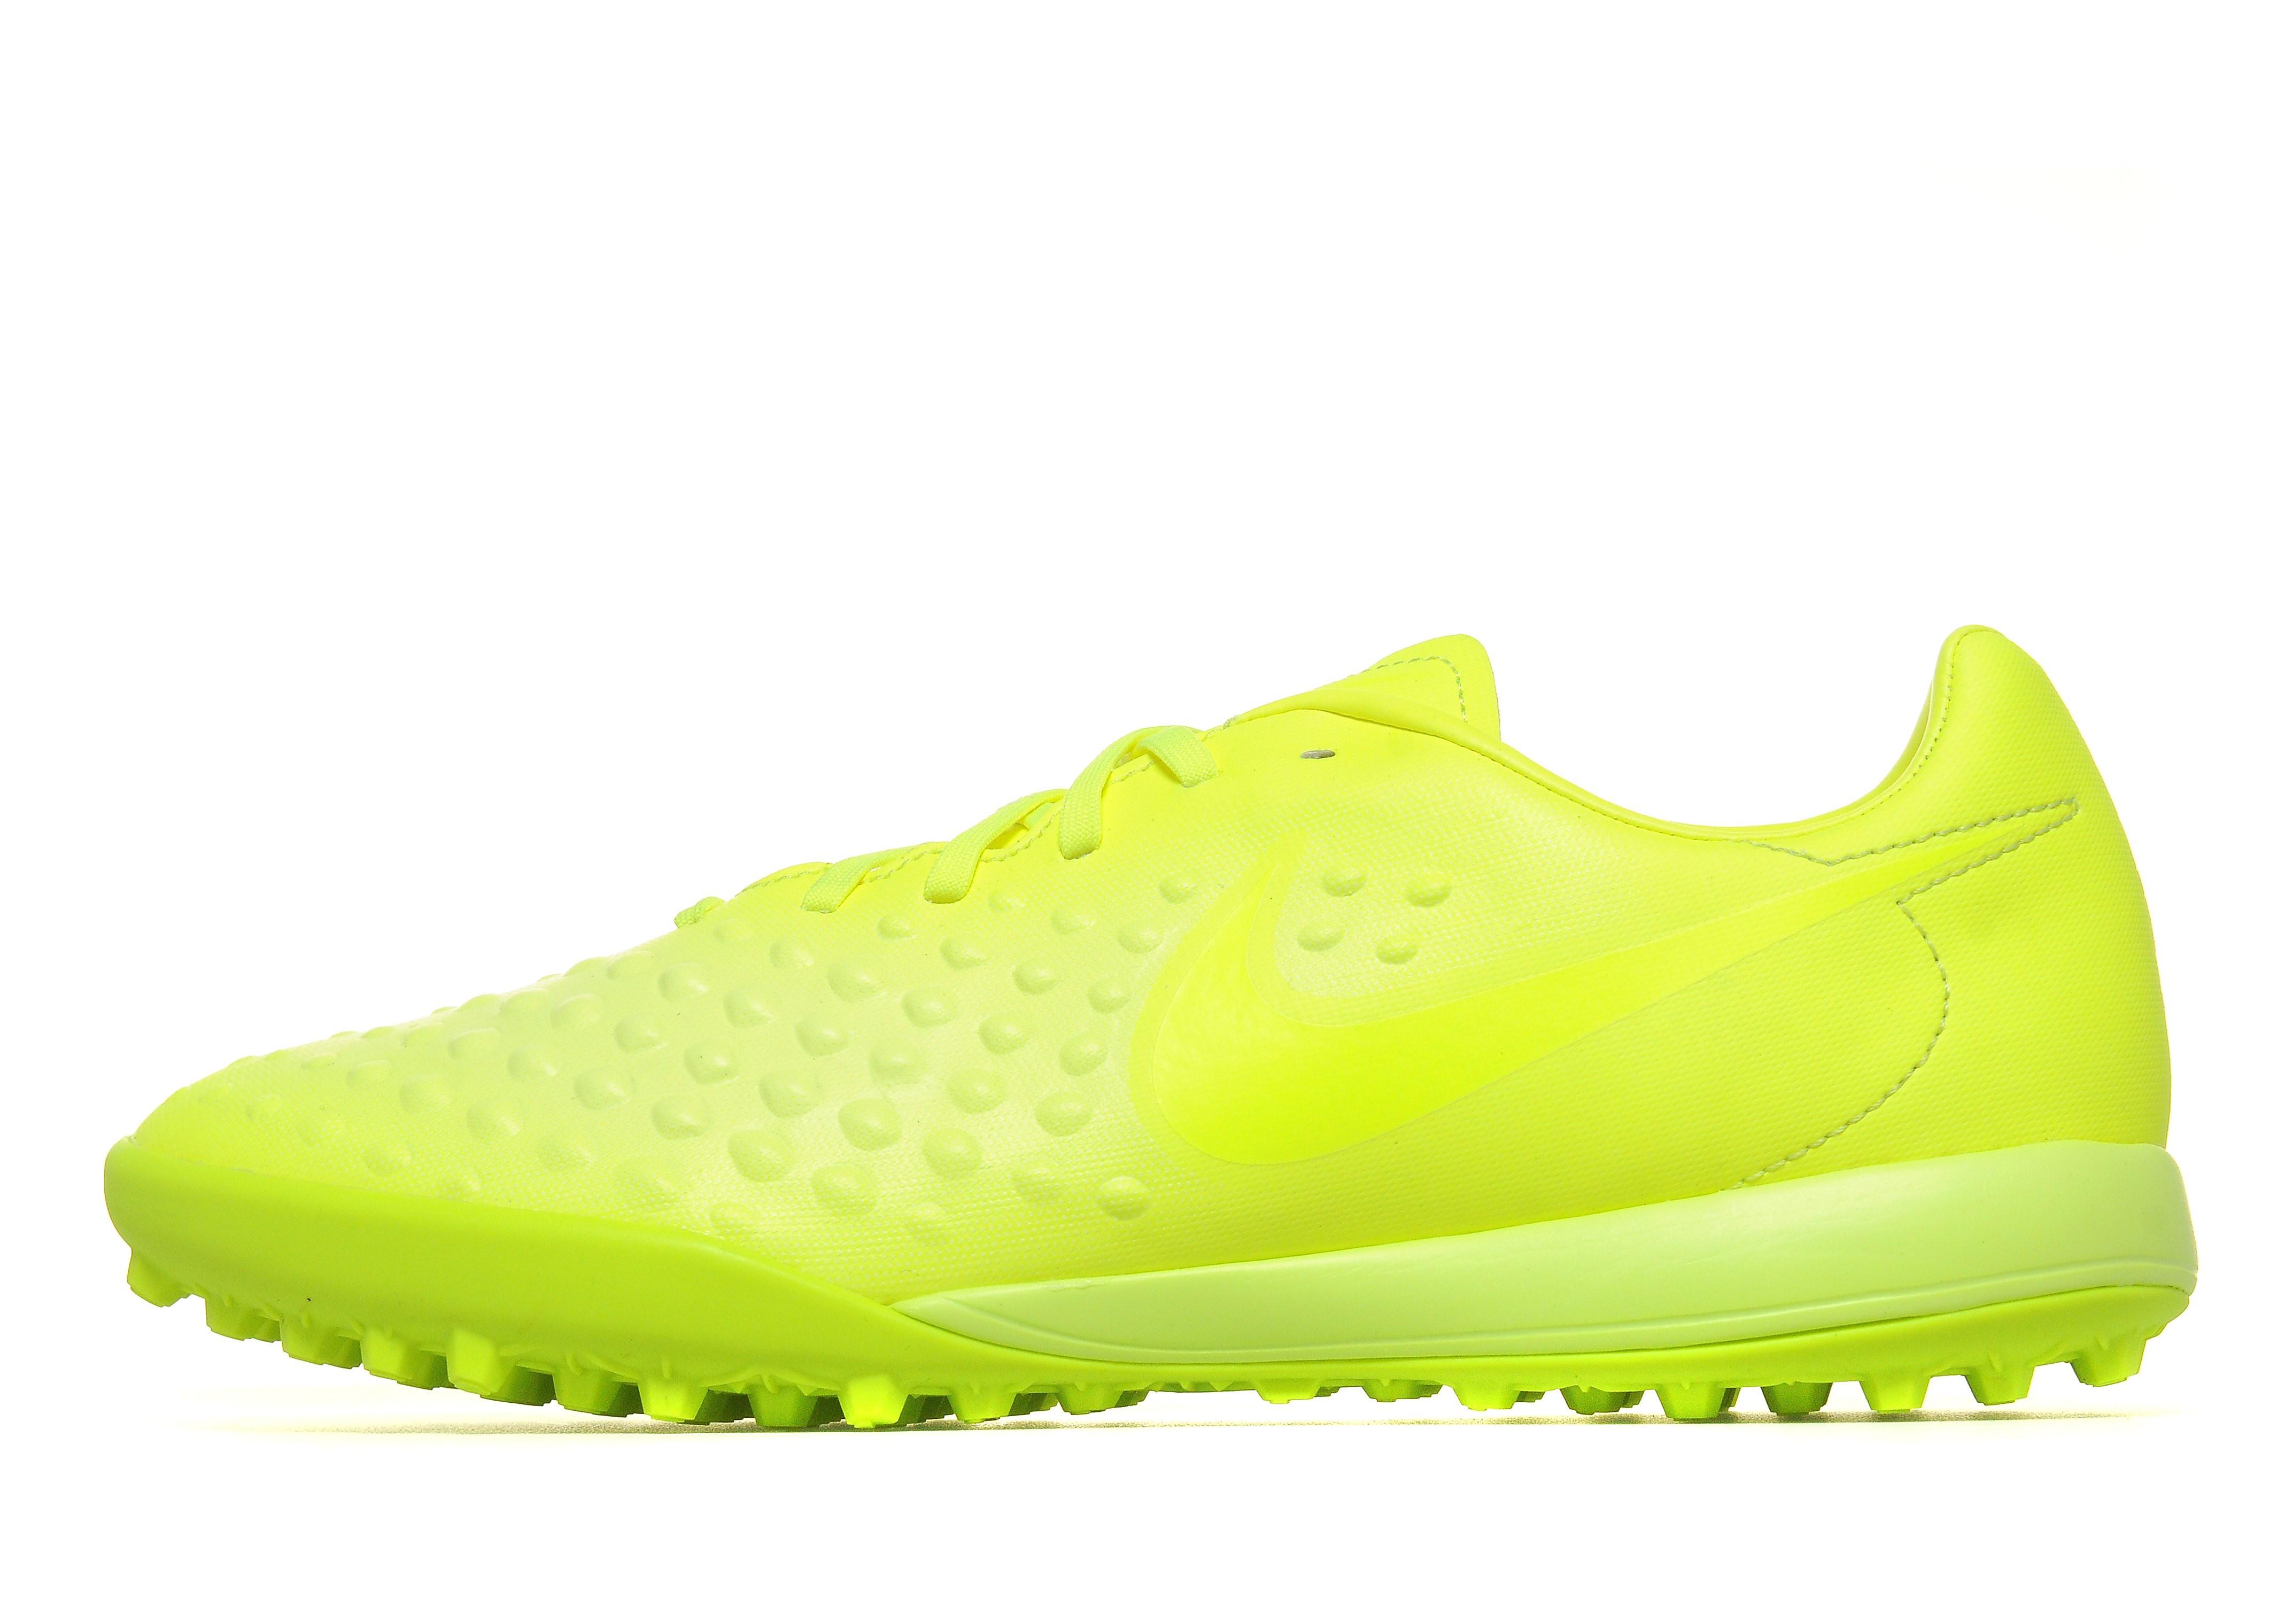 Nike Football X Glow MagistaX Onda Turf